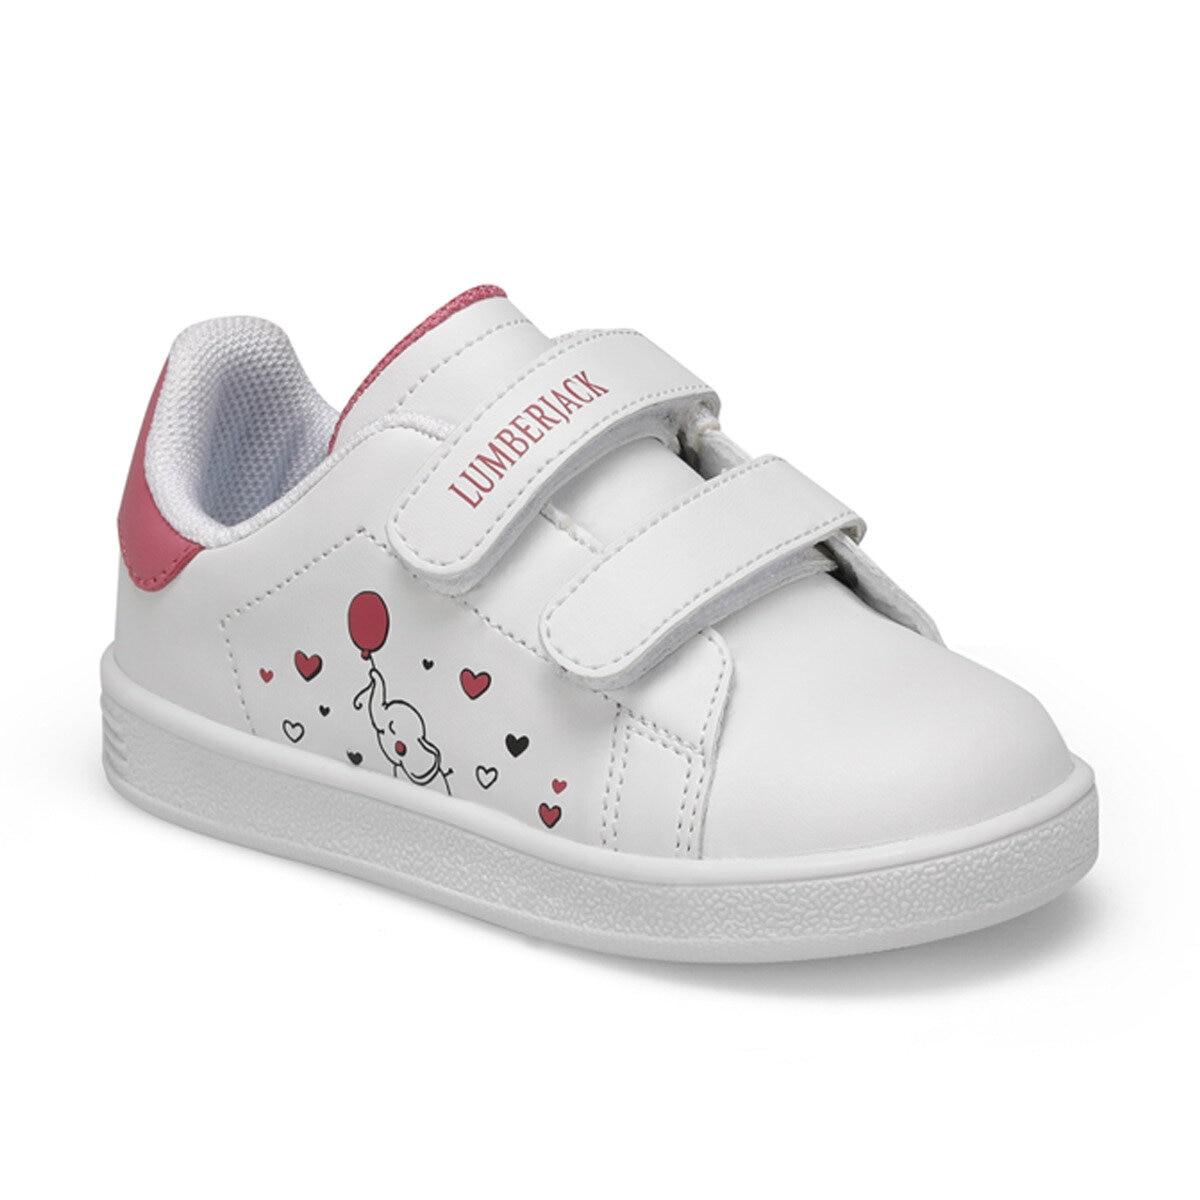 FLO PASSION White Female Child Sneaker Shoes LUMBERJACK